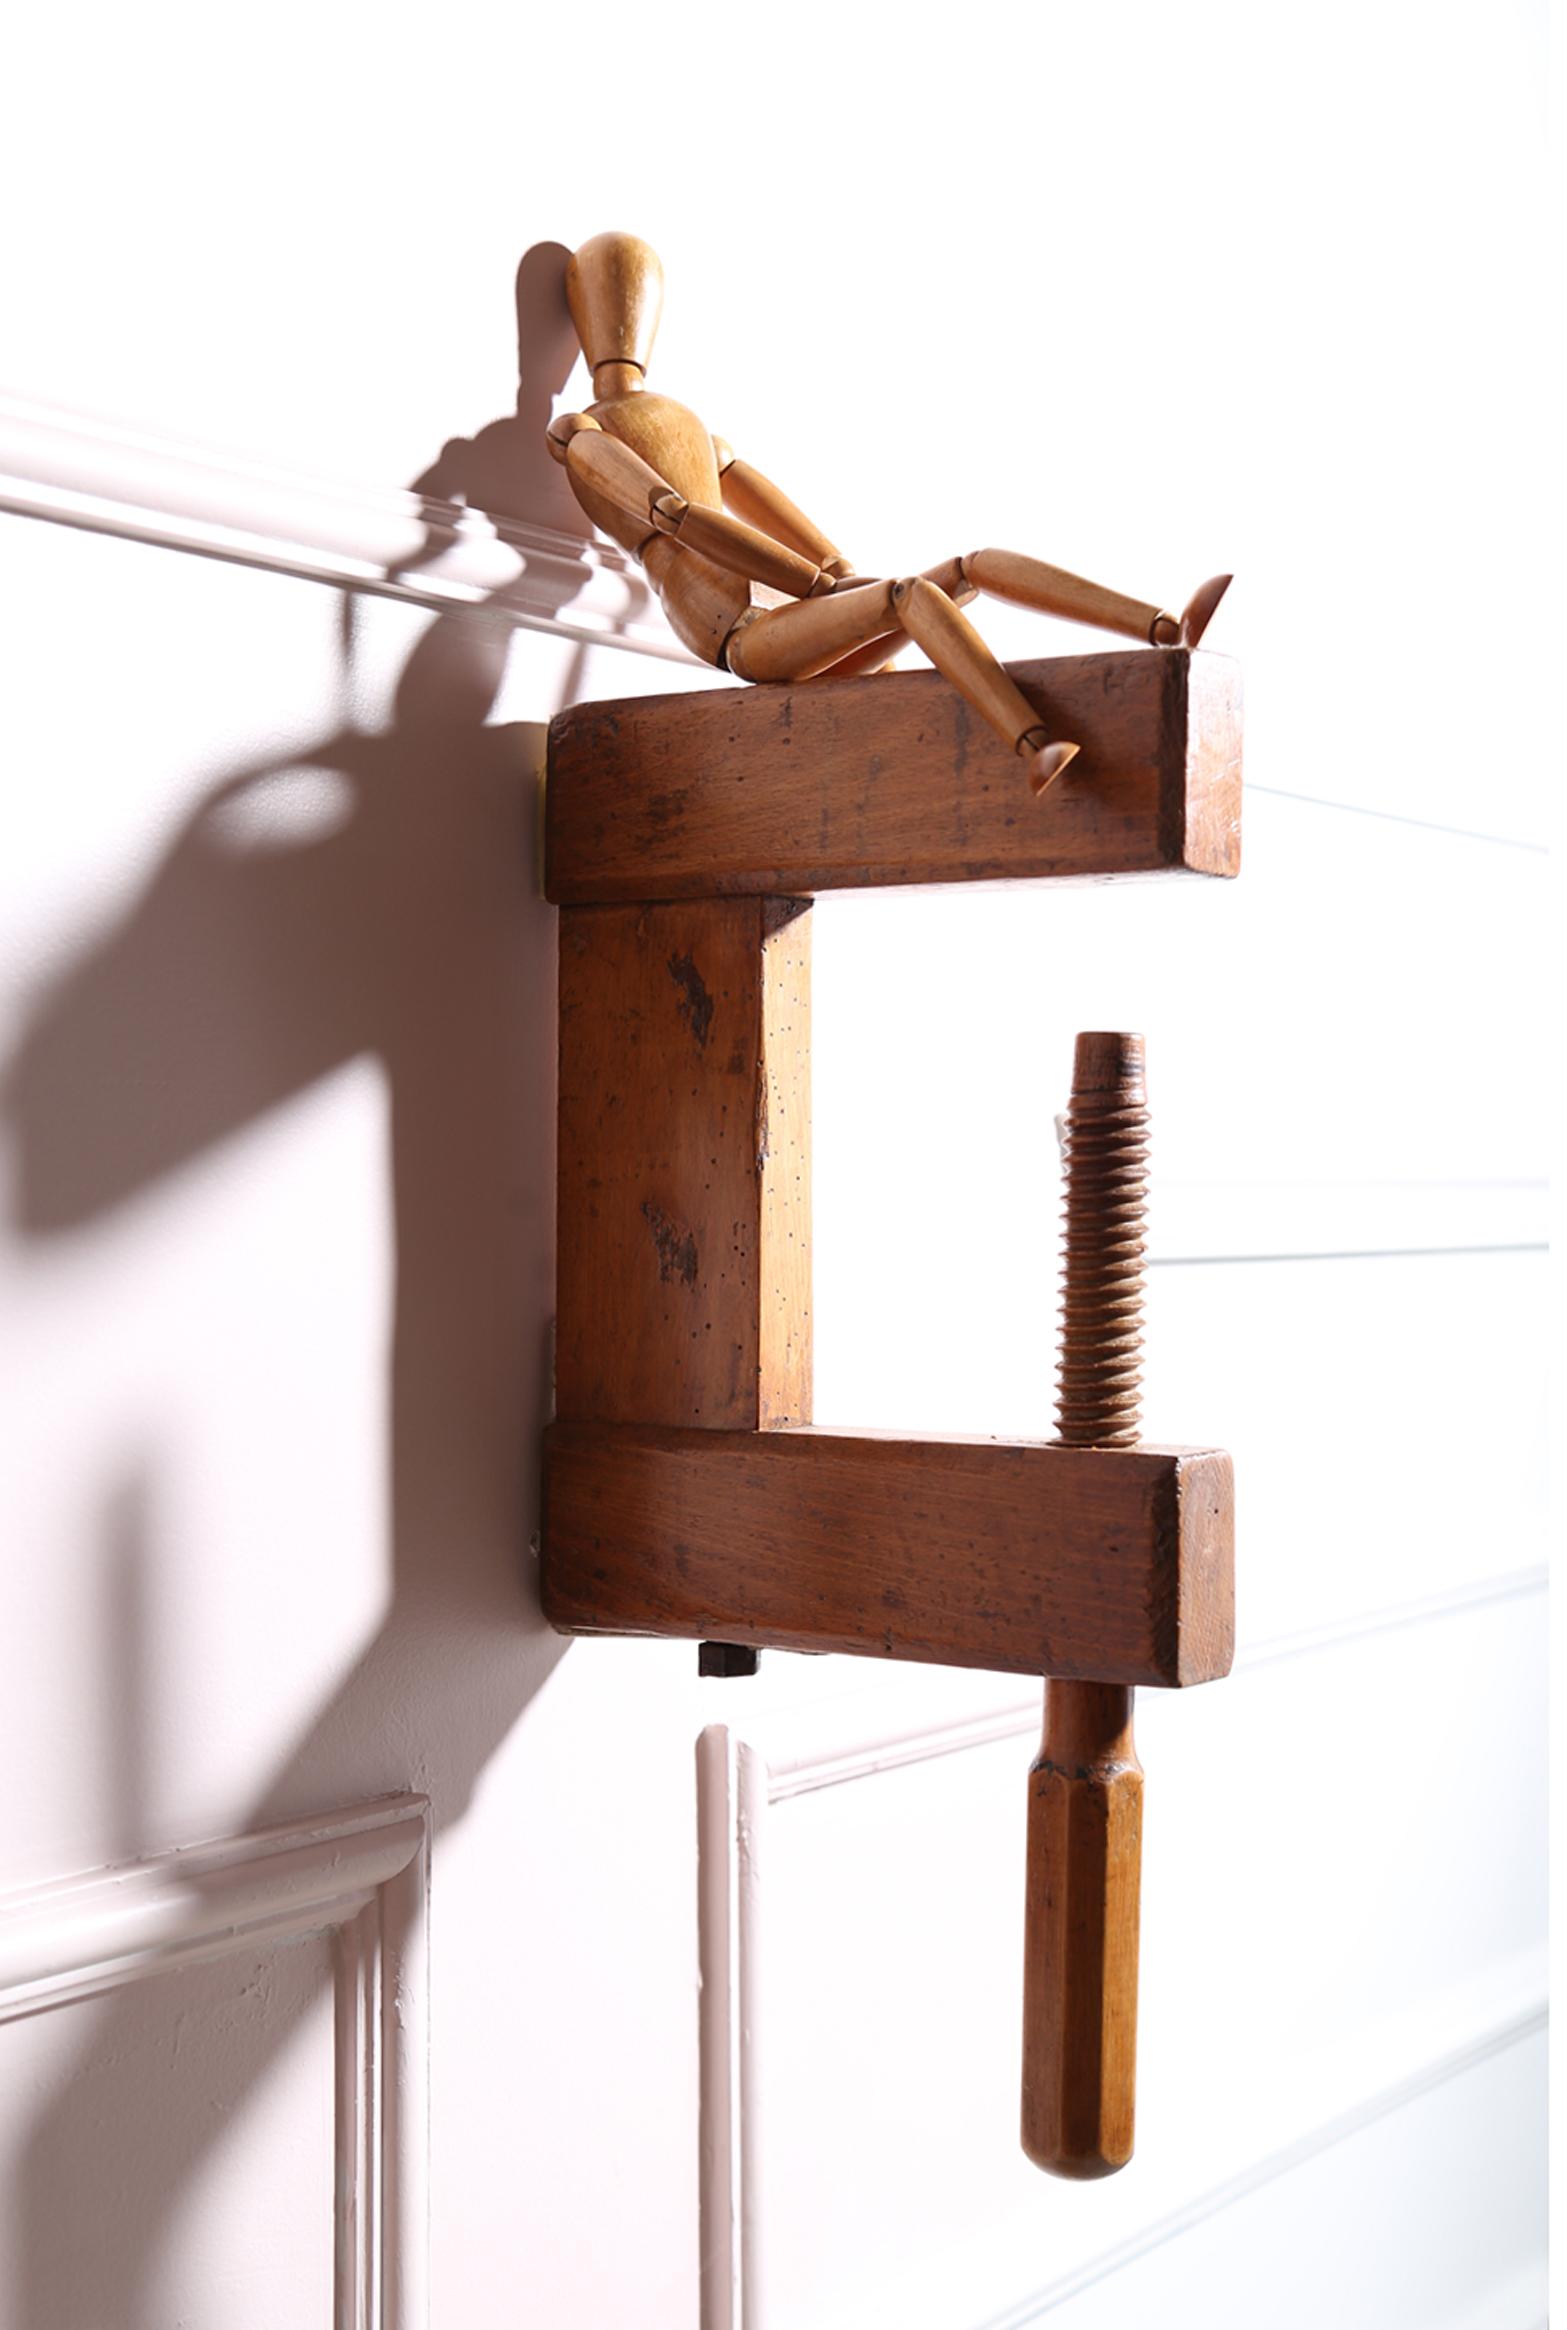 Gancho de madeira